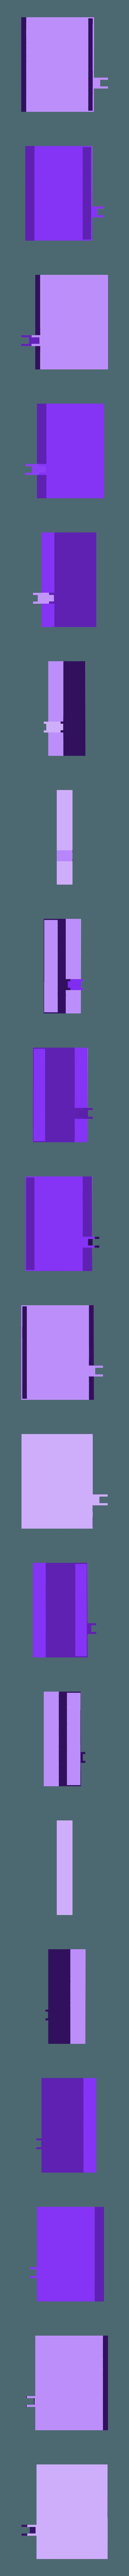 Mesita_Impresora_unica_3.stl Download STL file Raiscube_R2 Tool table • Object to 3D print, jankitokarczew